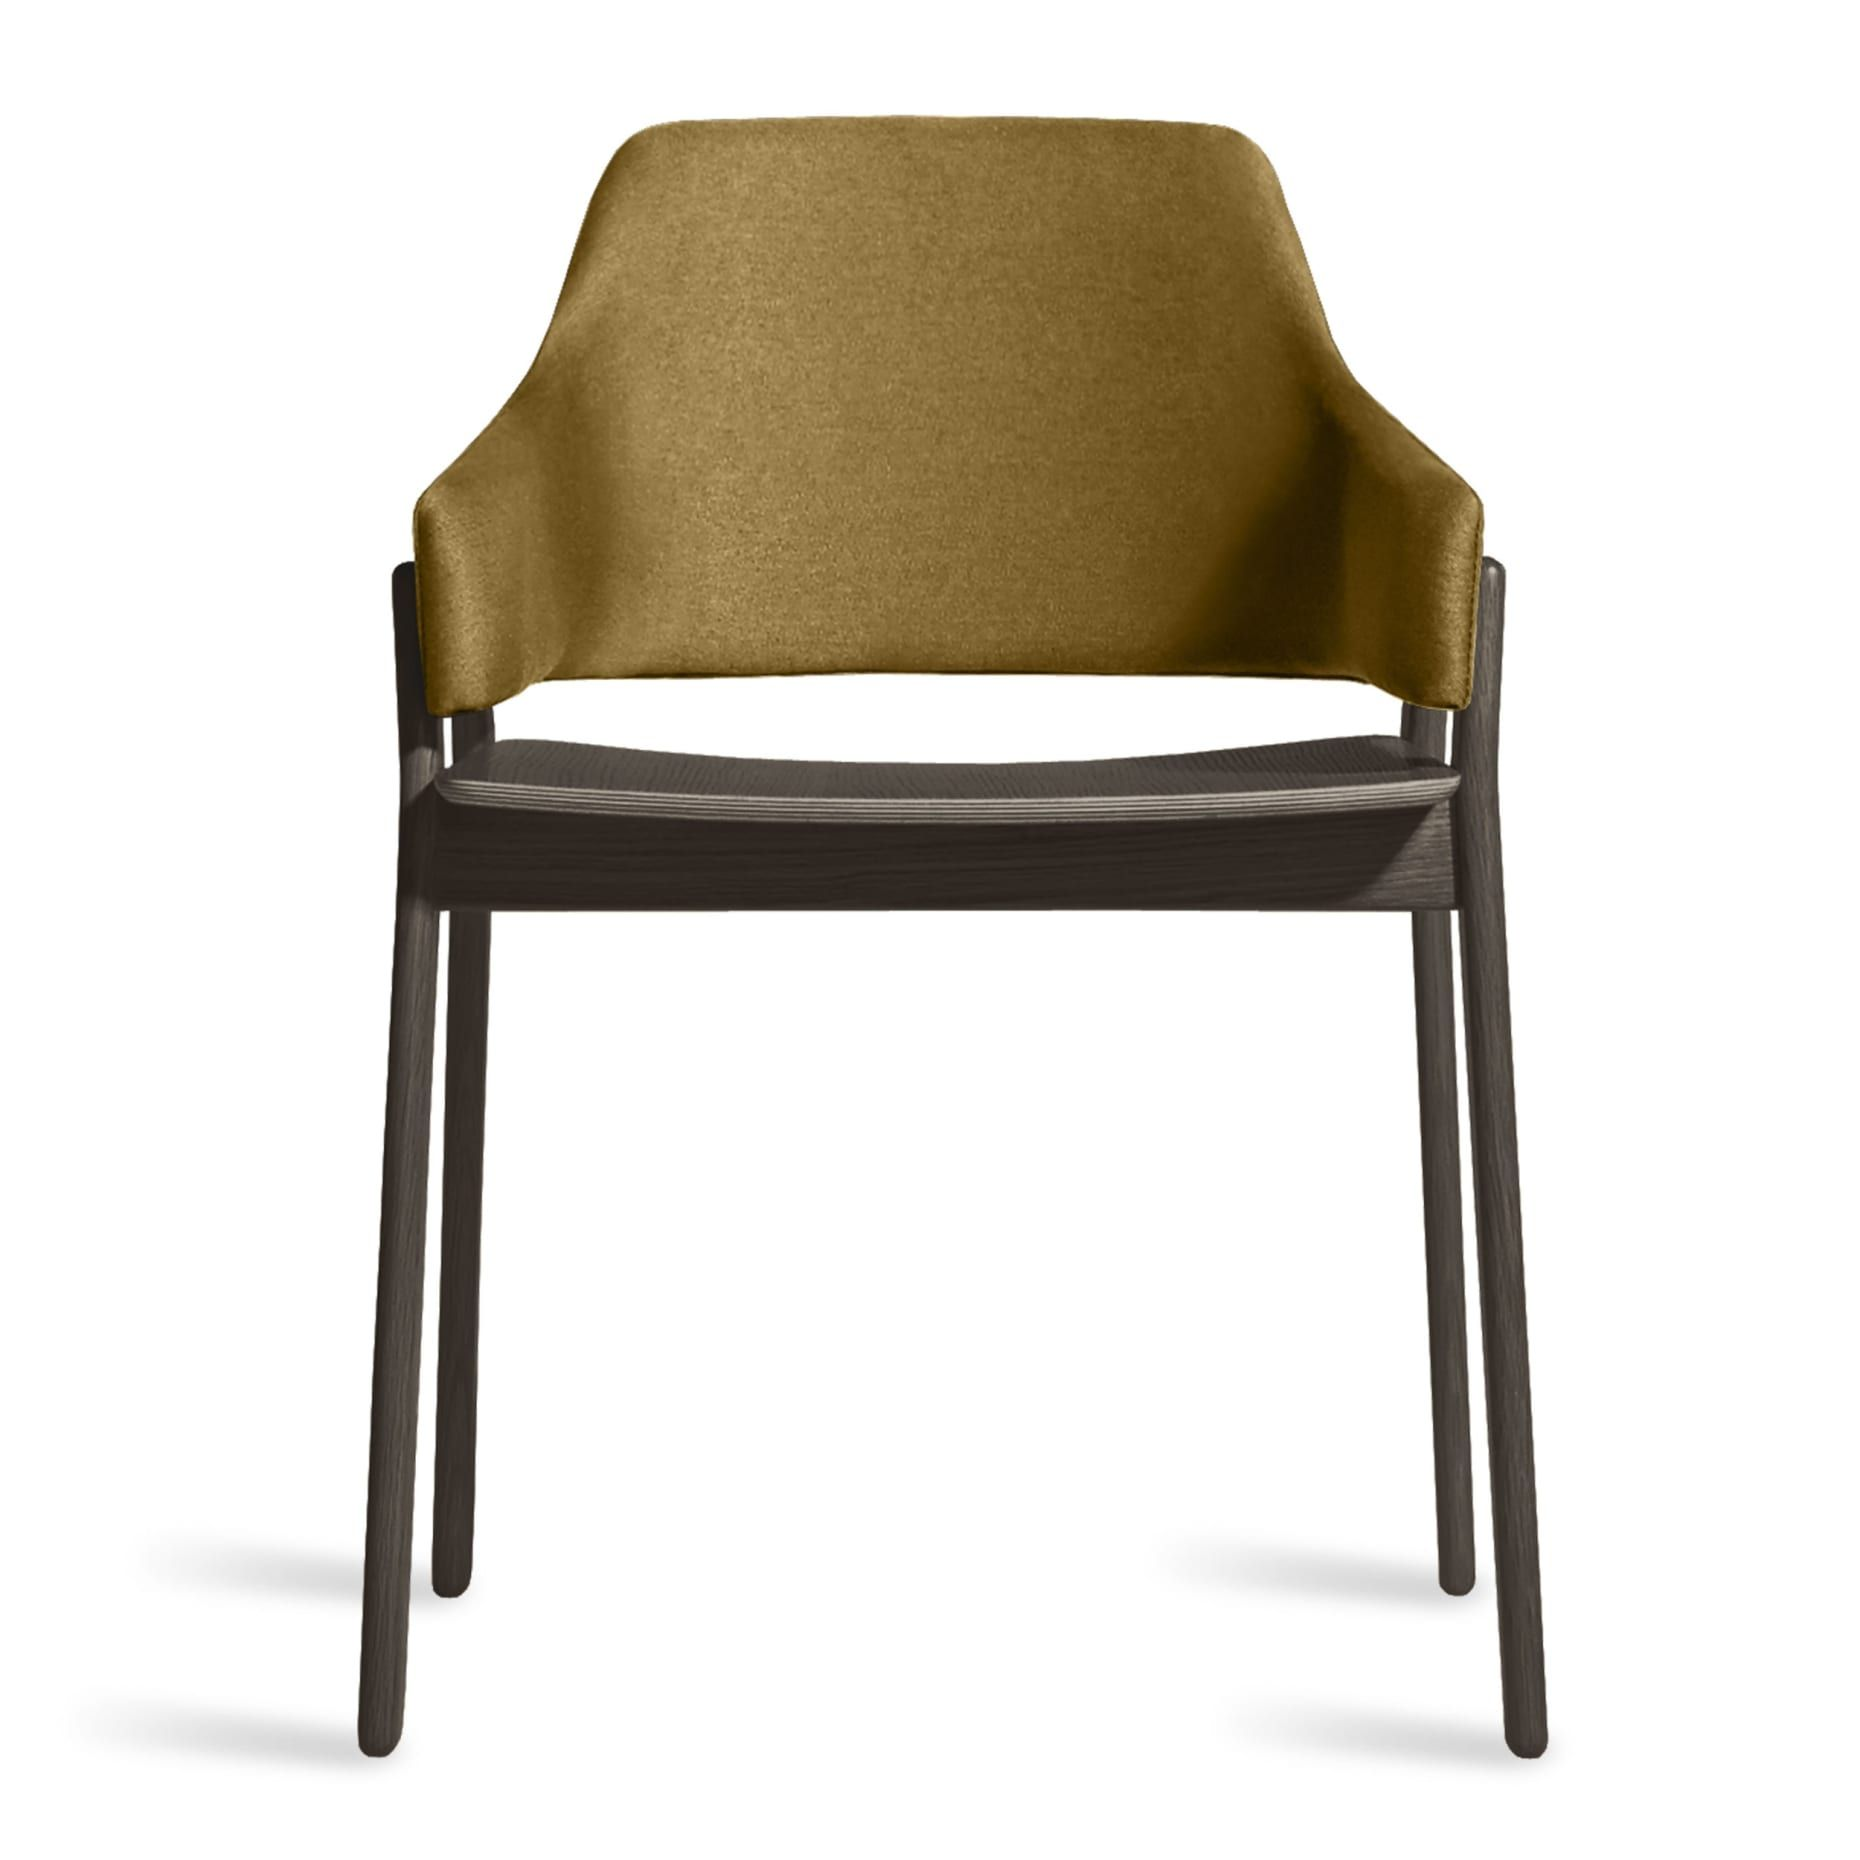 Tremendous Clutch Dining Chair Navy On Ash Edwards Navy Furniture Machost Co Dining Chair Design Ideas Machostcouk